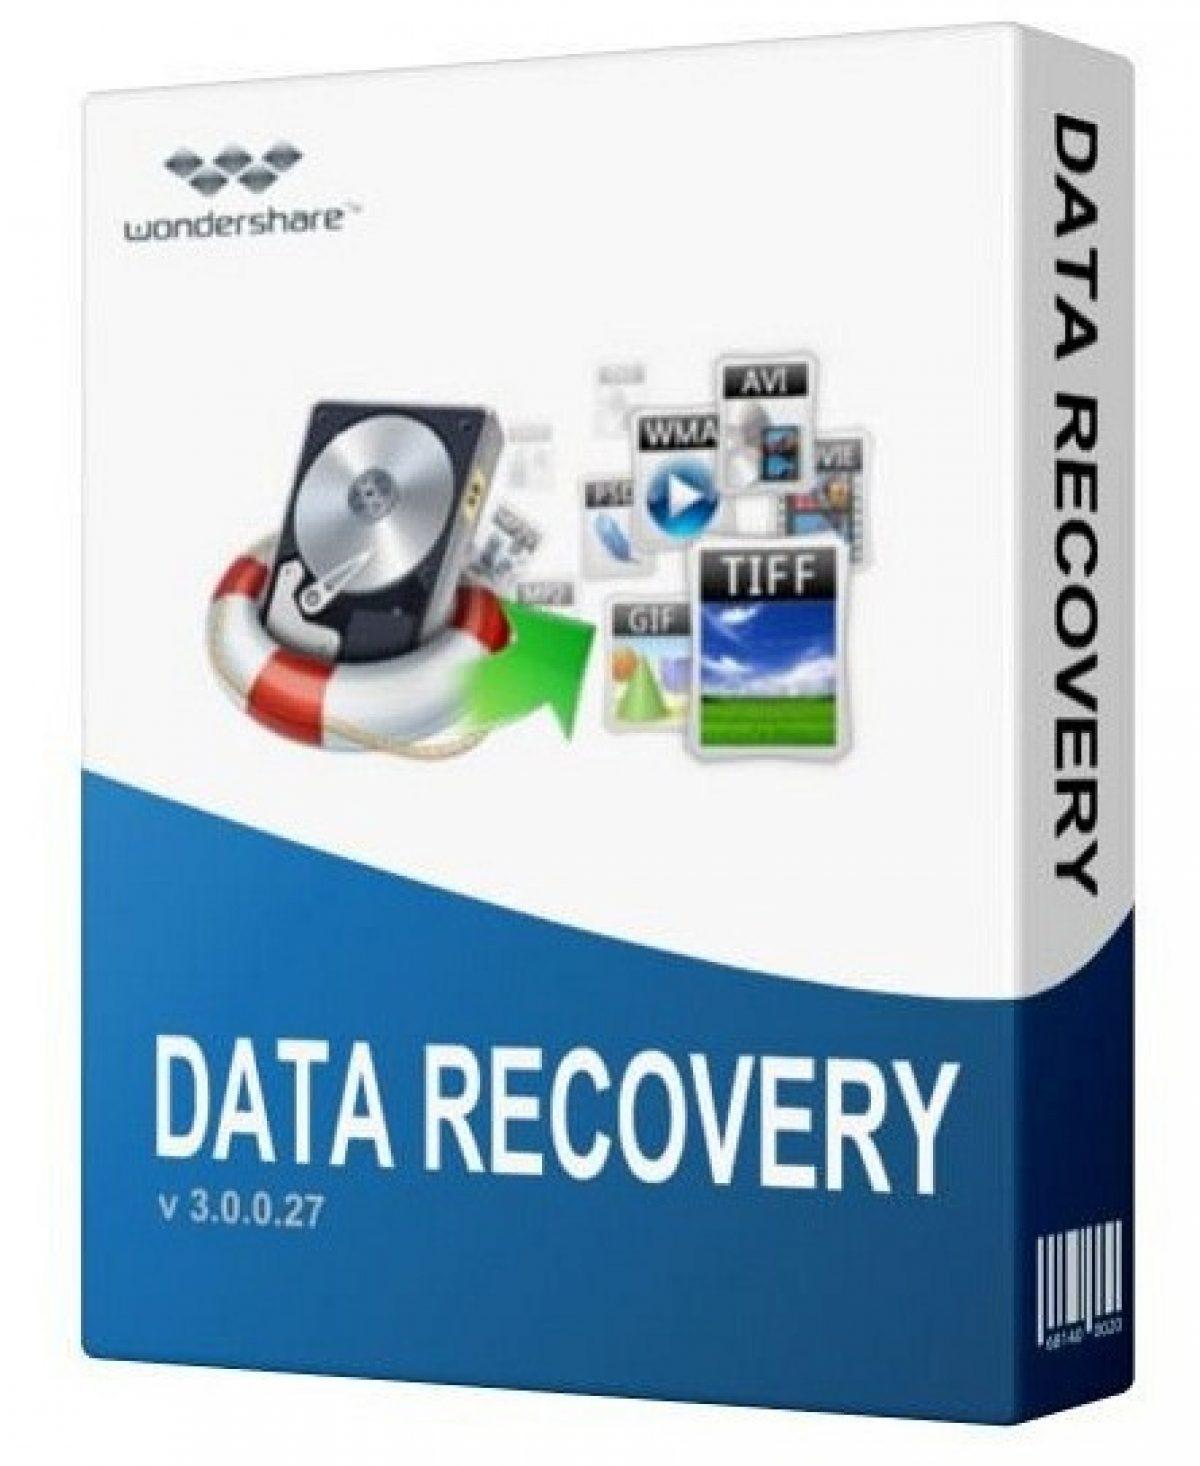 Wondershare Data Recovery 5.0 Free download Full Version